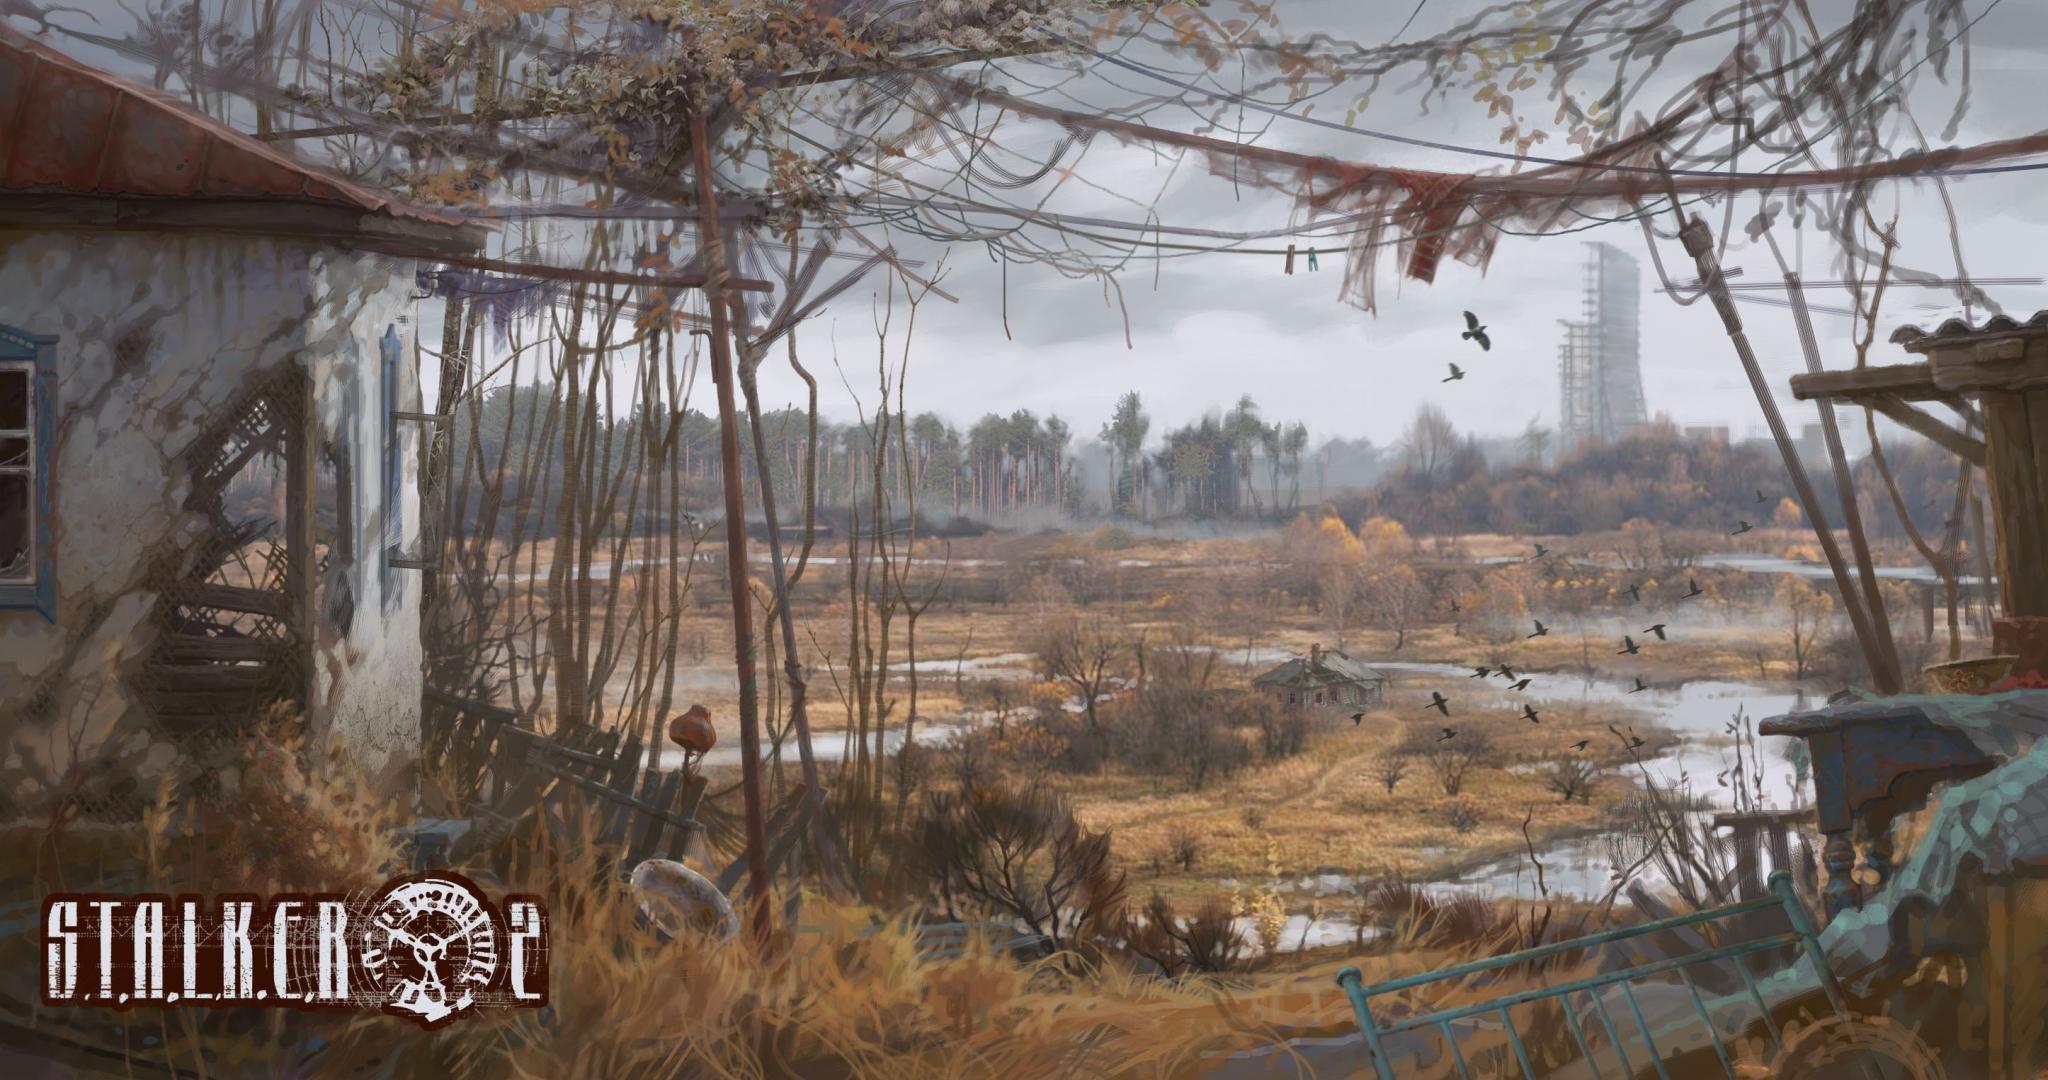 Download Hd 2048x1080 Stalker Shadow Of Chernobyl Desktop